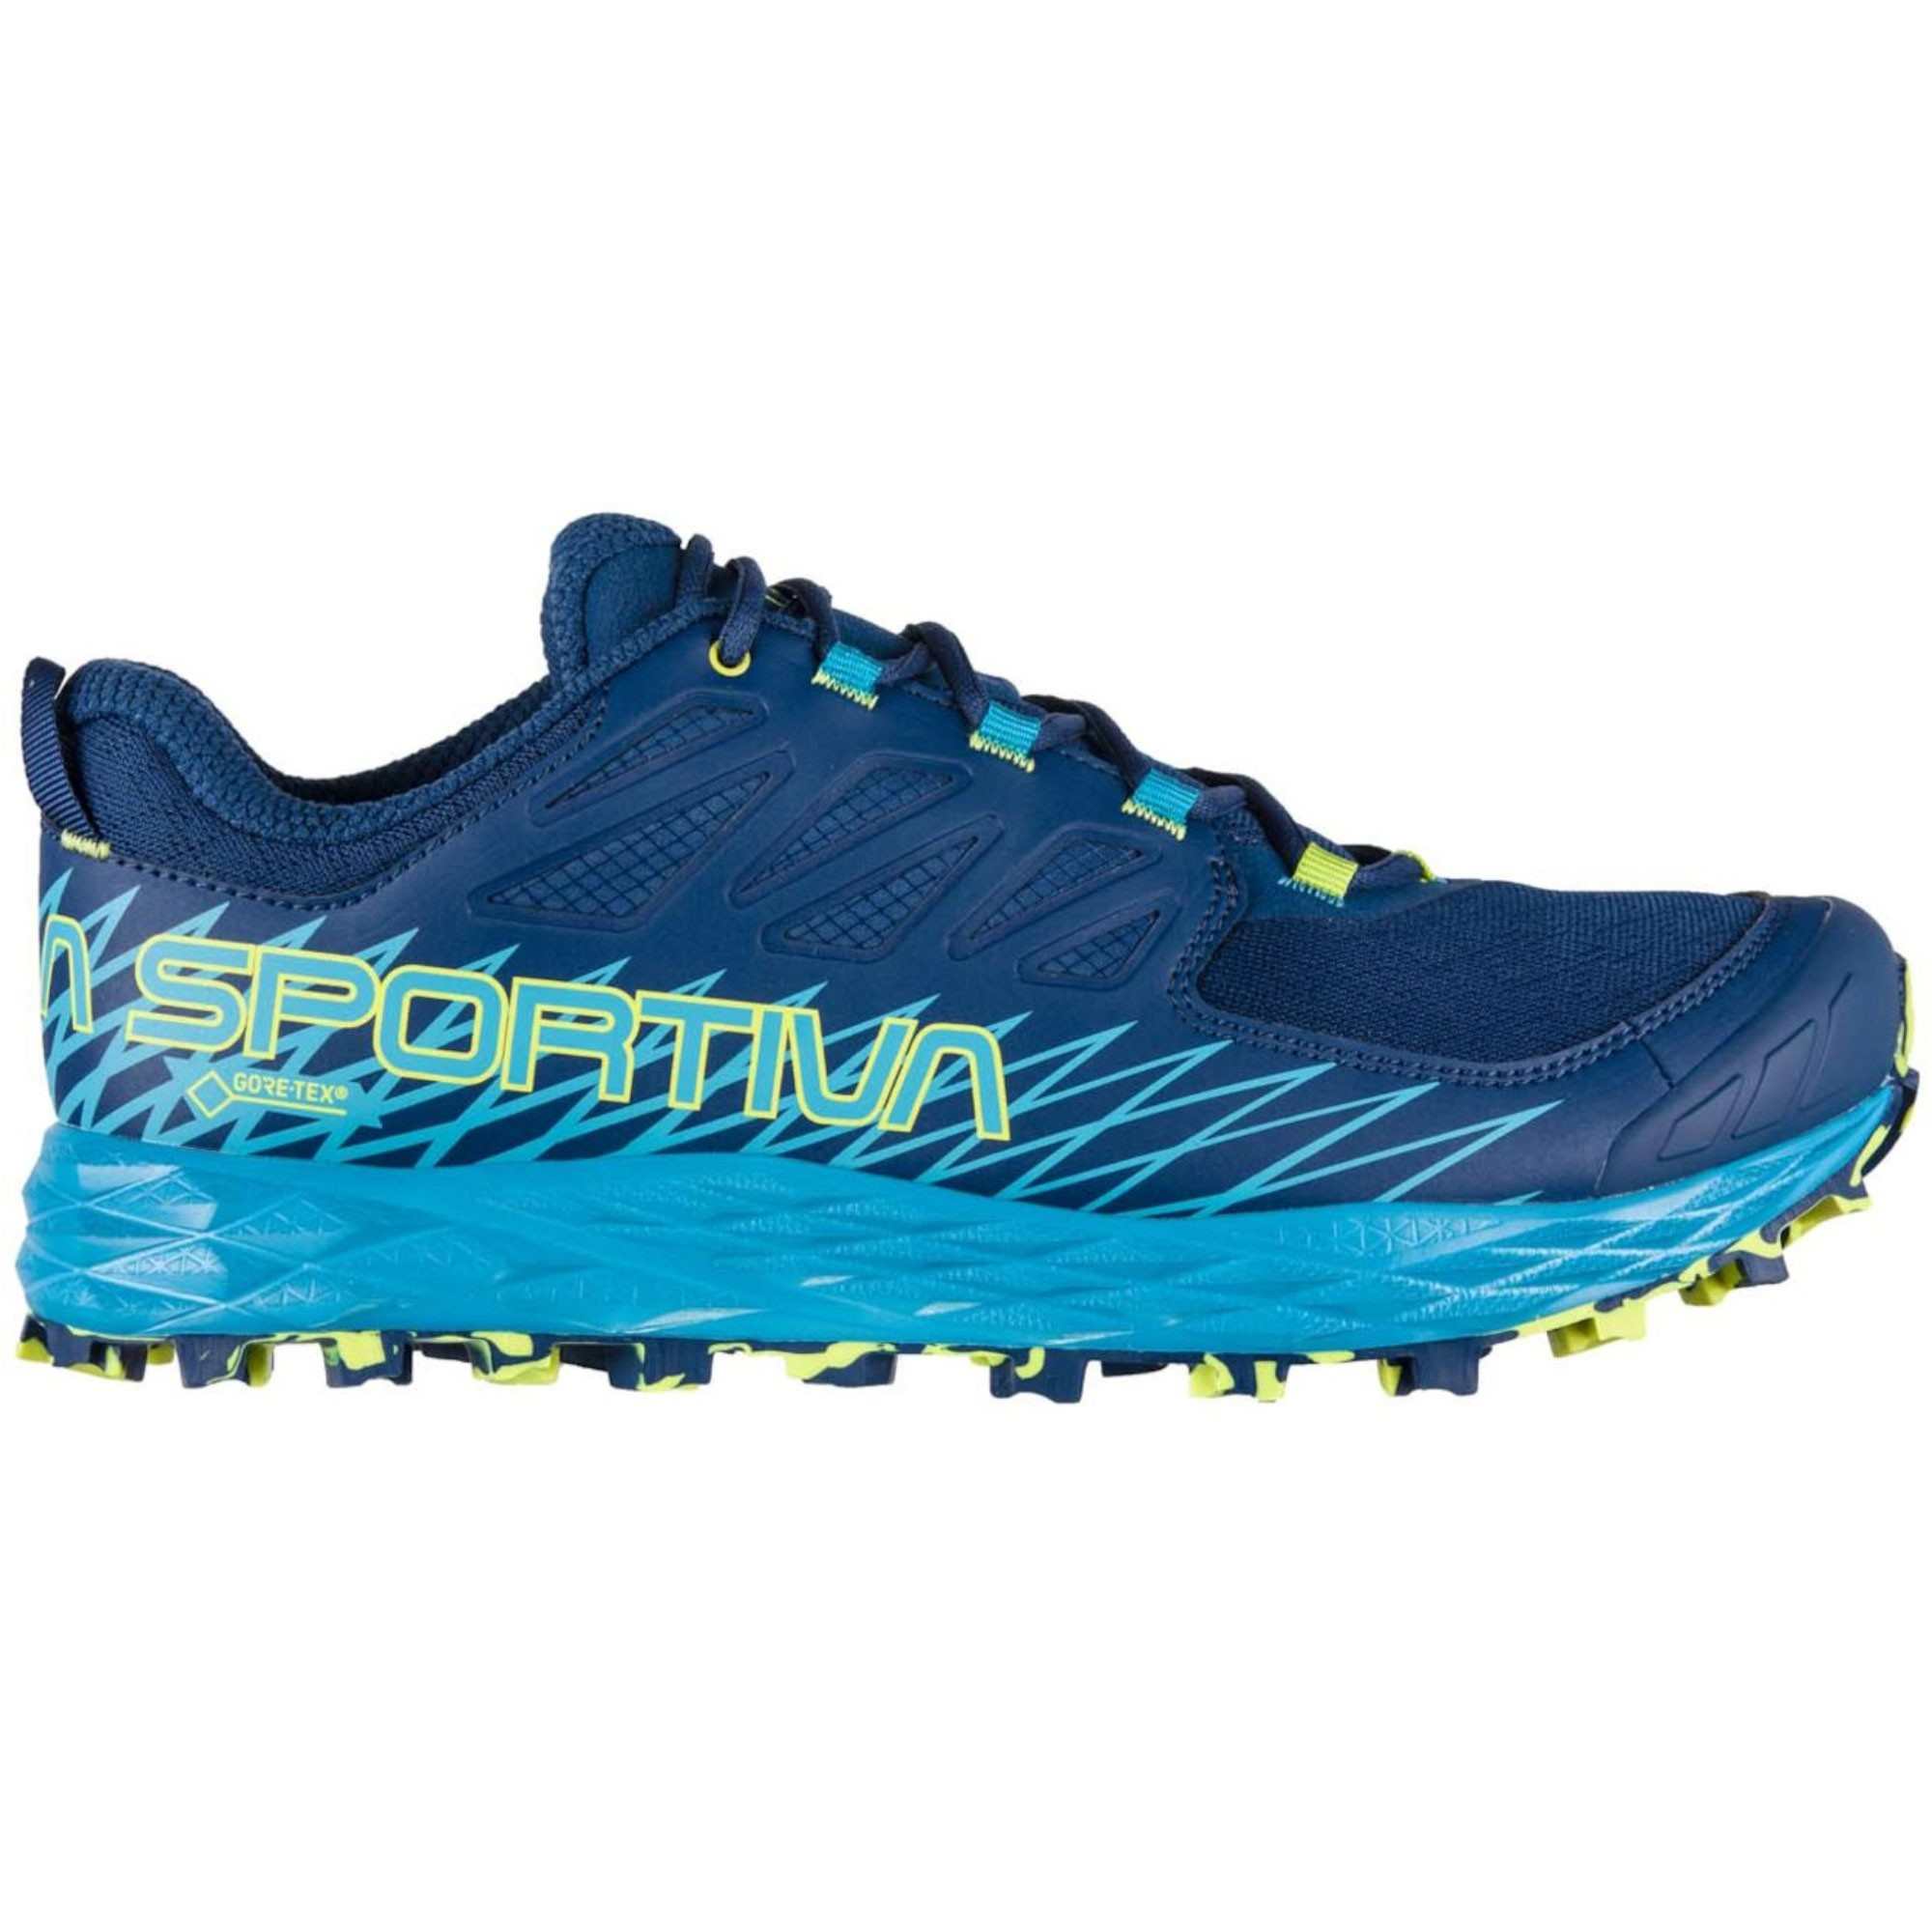 La Sportiva Lycan GTX Men's Trail Running Shoes - Indigo/Tropic Blue